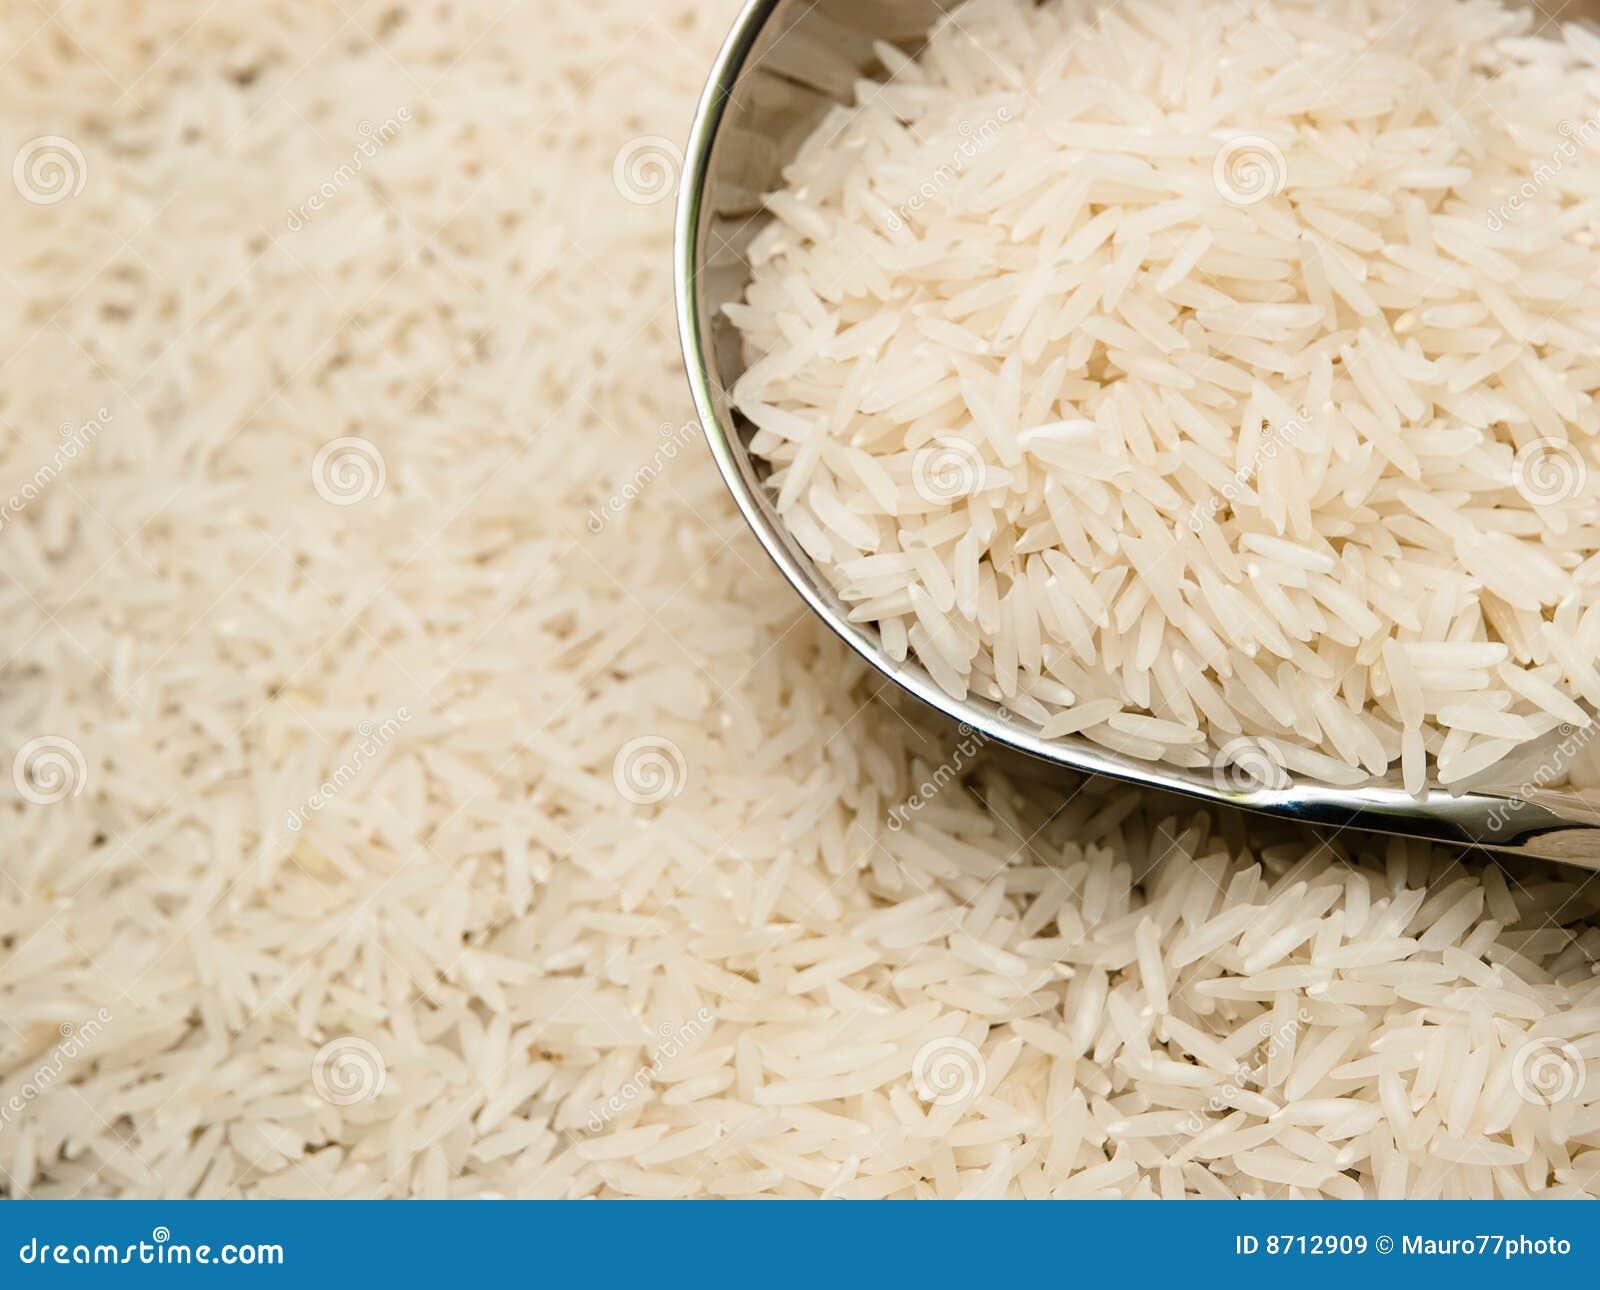 Basmati rice and ladle